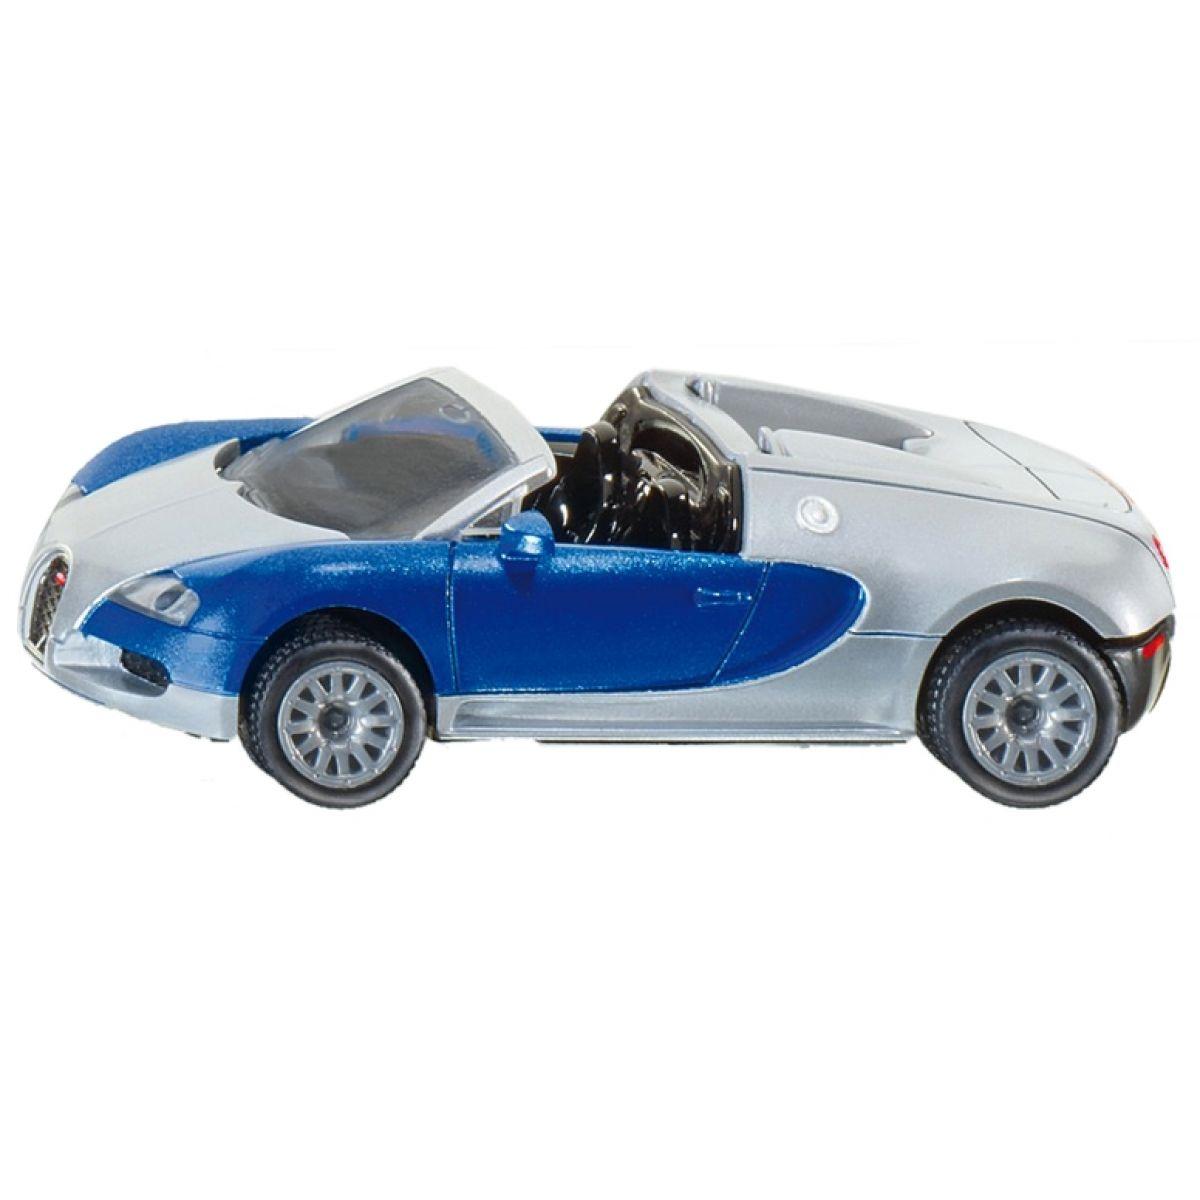 Bugatti Veyron Grand Sport 1:55